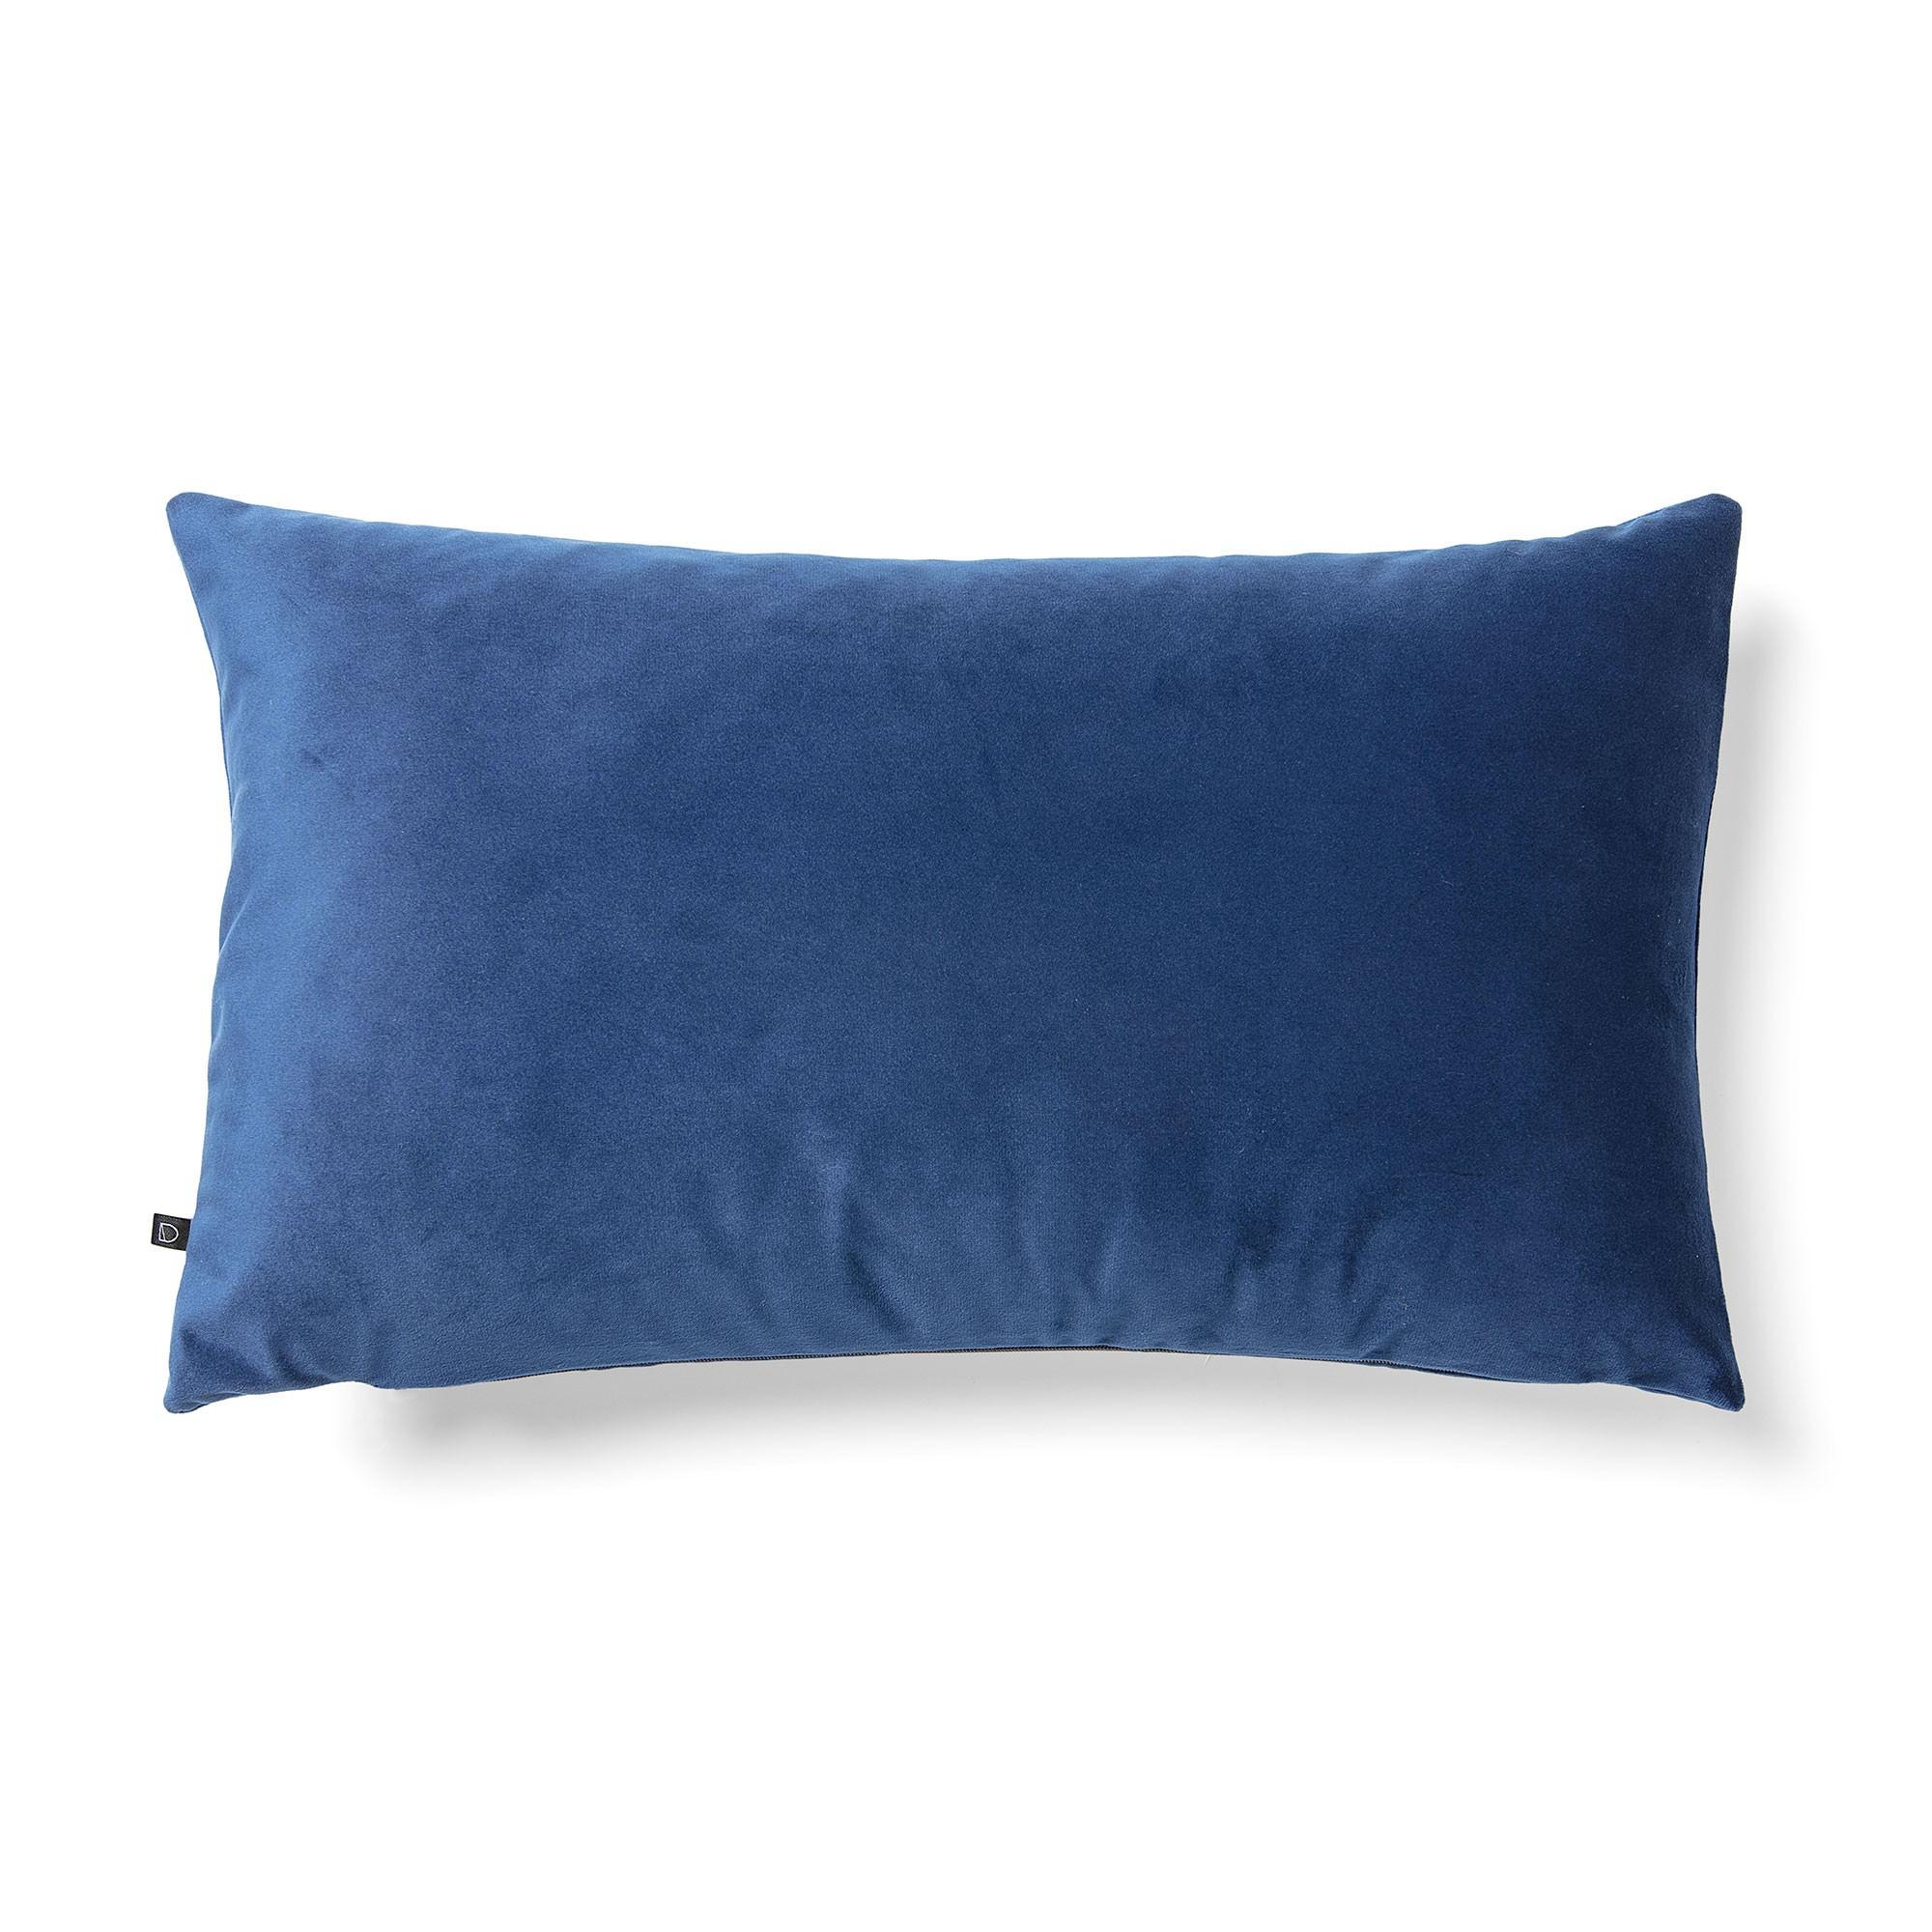 Daraya Velvet Fabric Lumbar Cushion, Blue